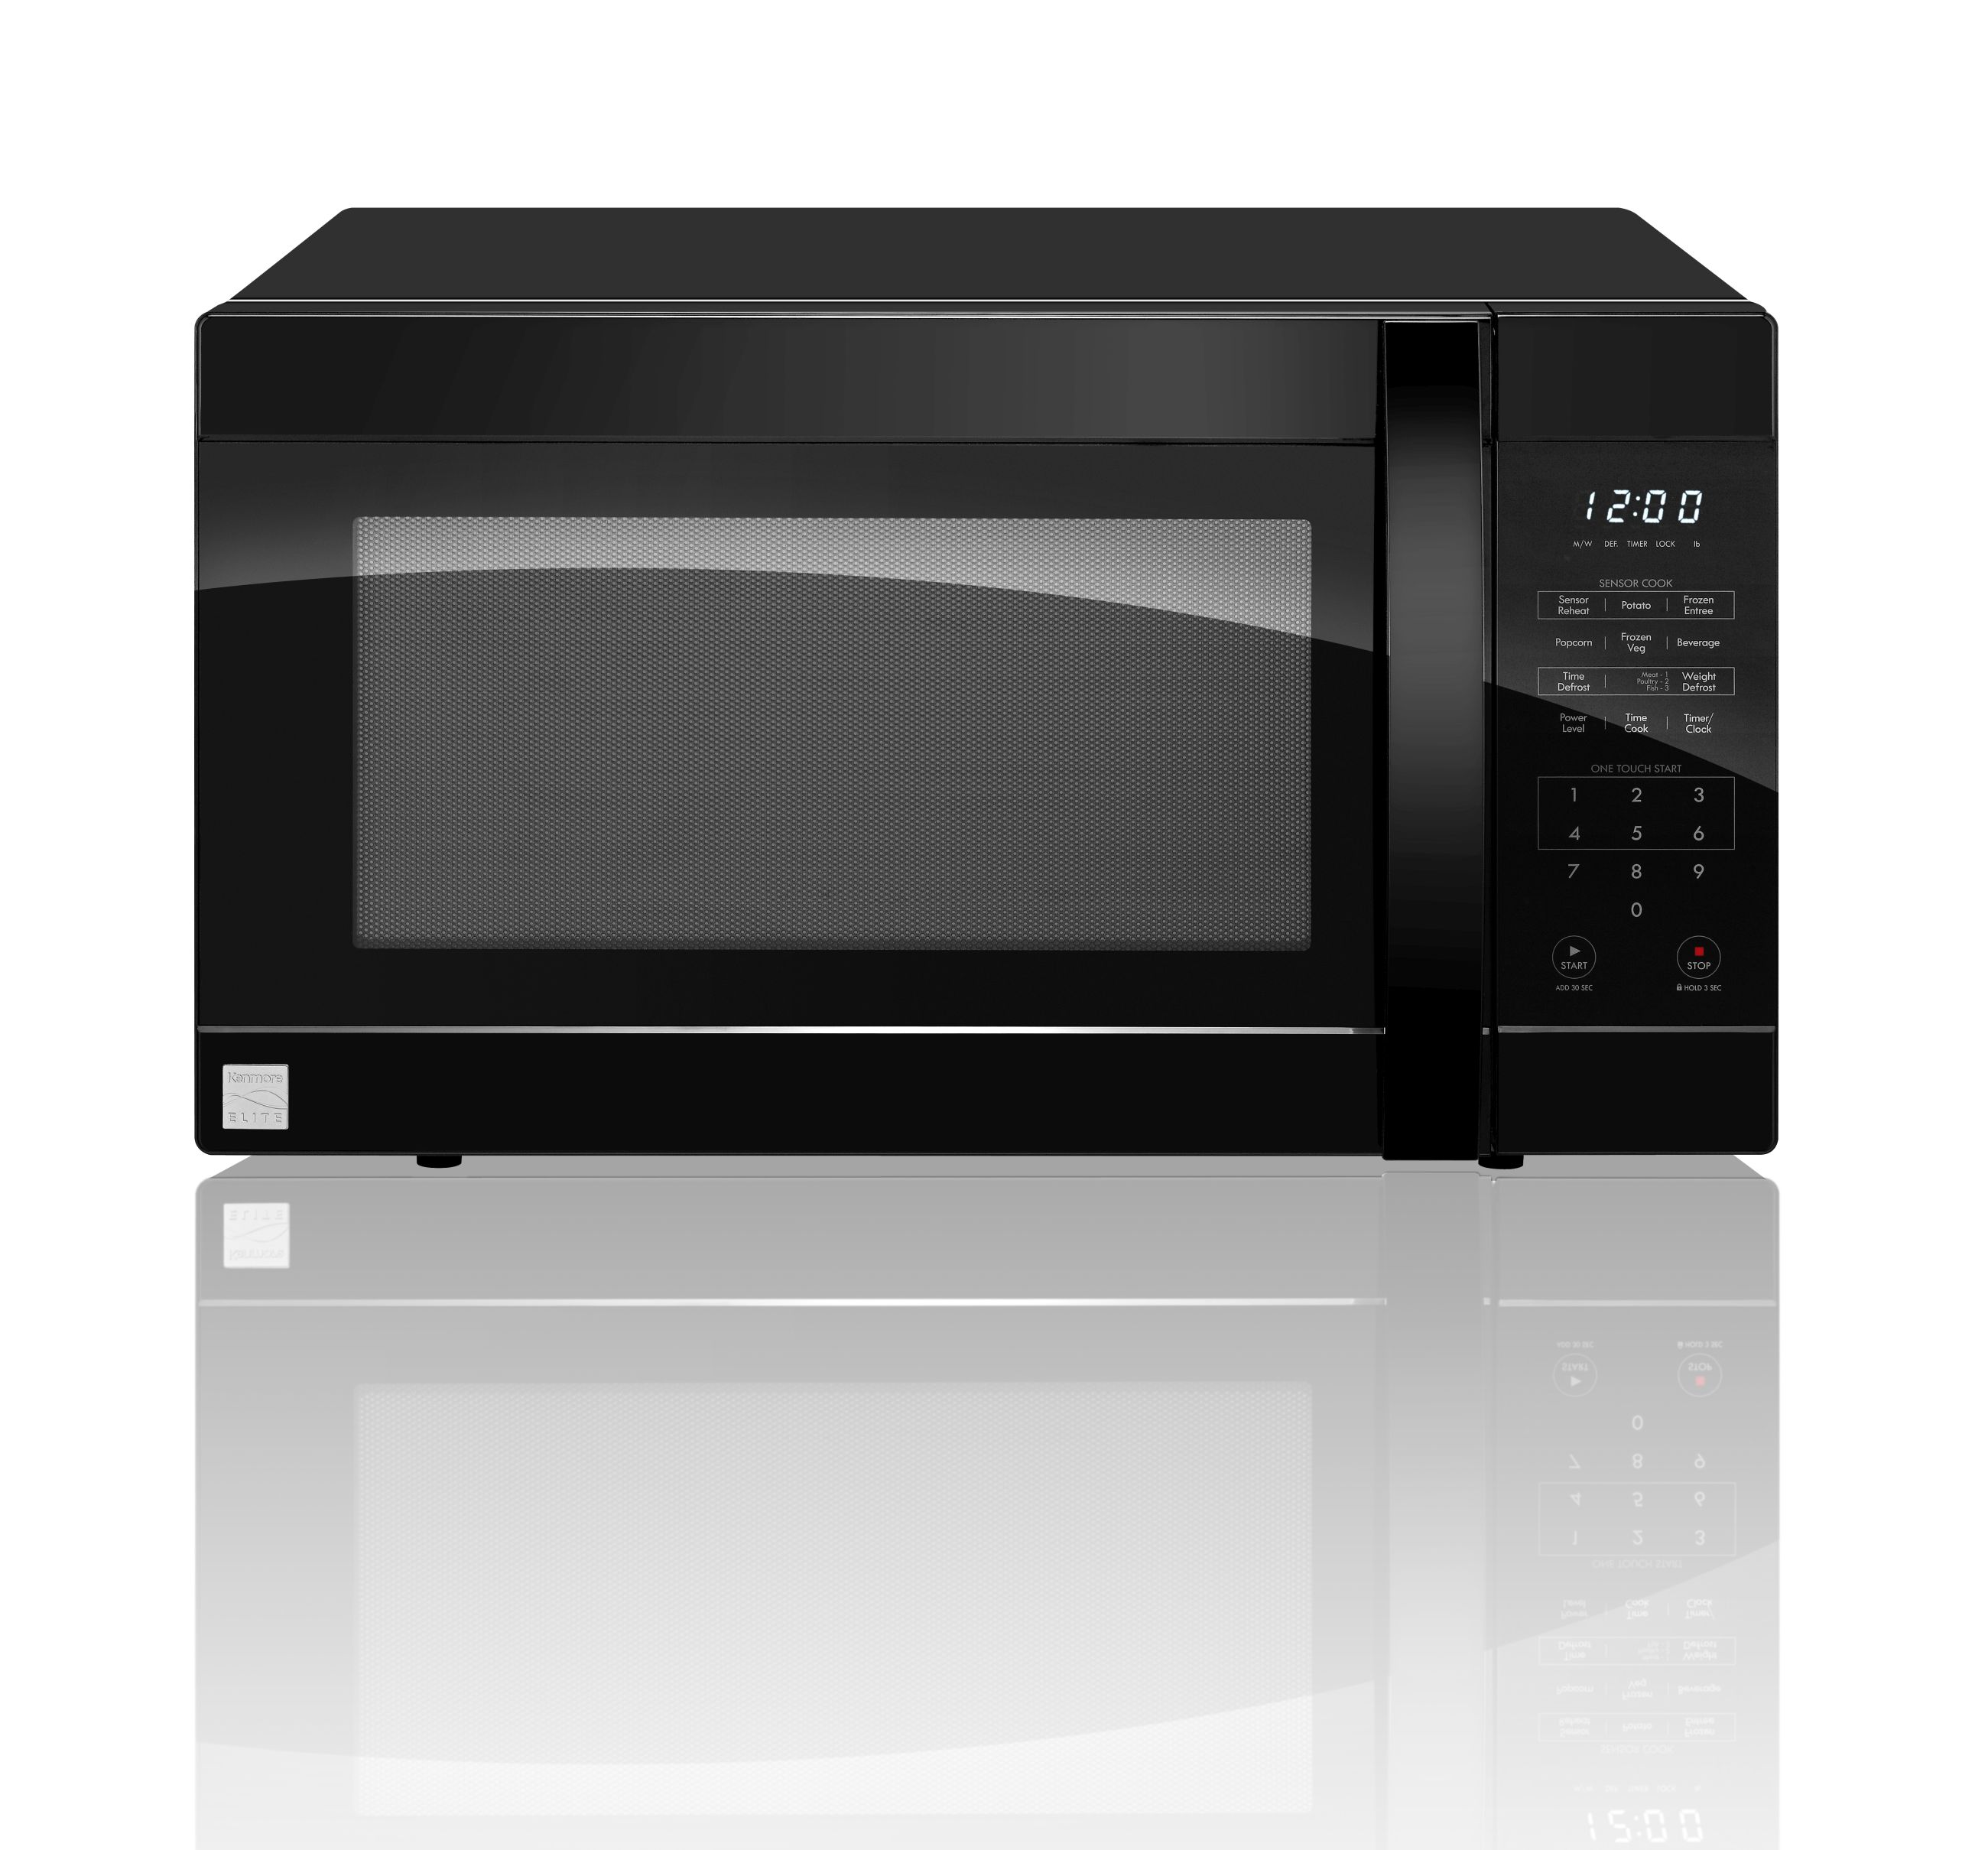 kenmore elite 72219 2 2 cu ft countertop microwave oven black